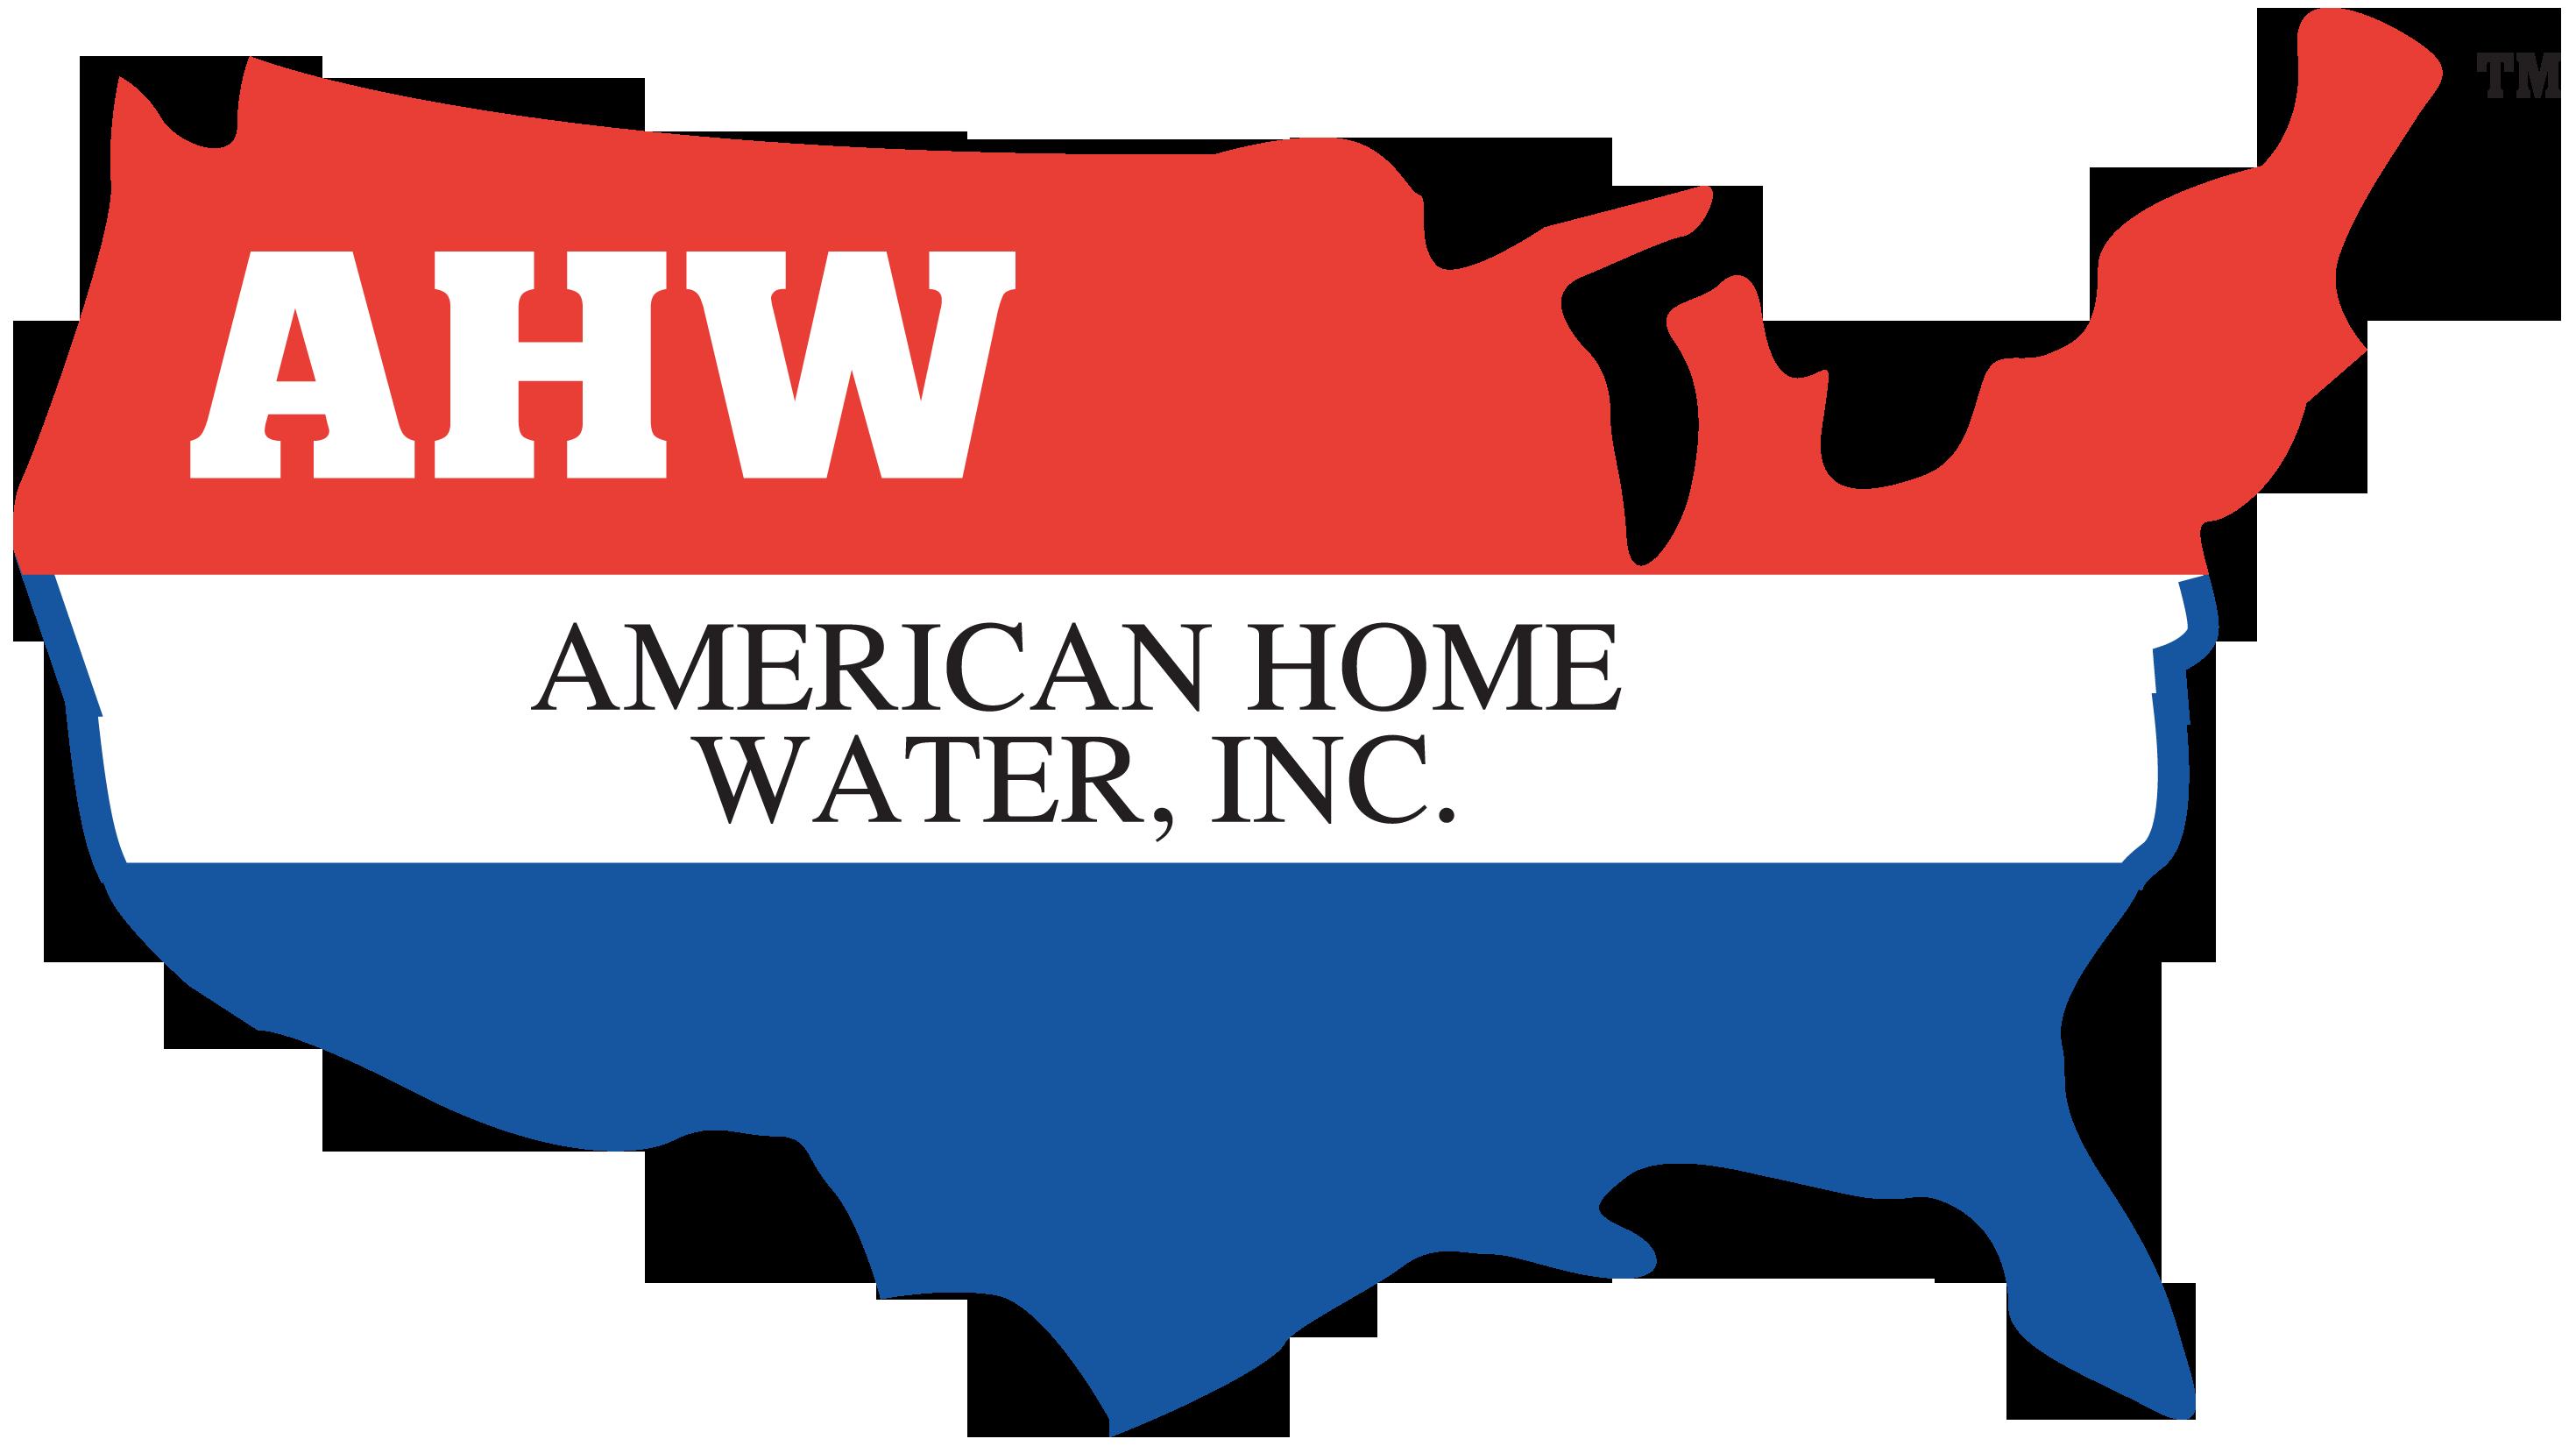 Water Softening Equipment Supplier in AZ Phoenix 85027 American Home Water & Air 22047 N. Black Canyon Hwy.  (602)993-0083